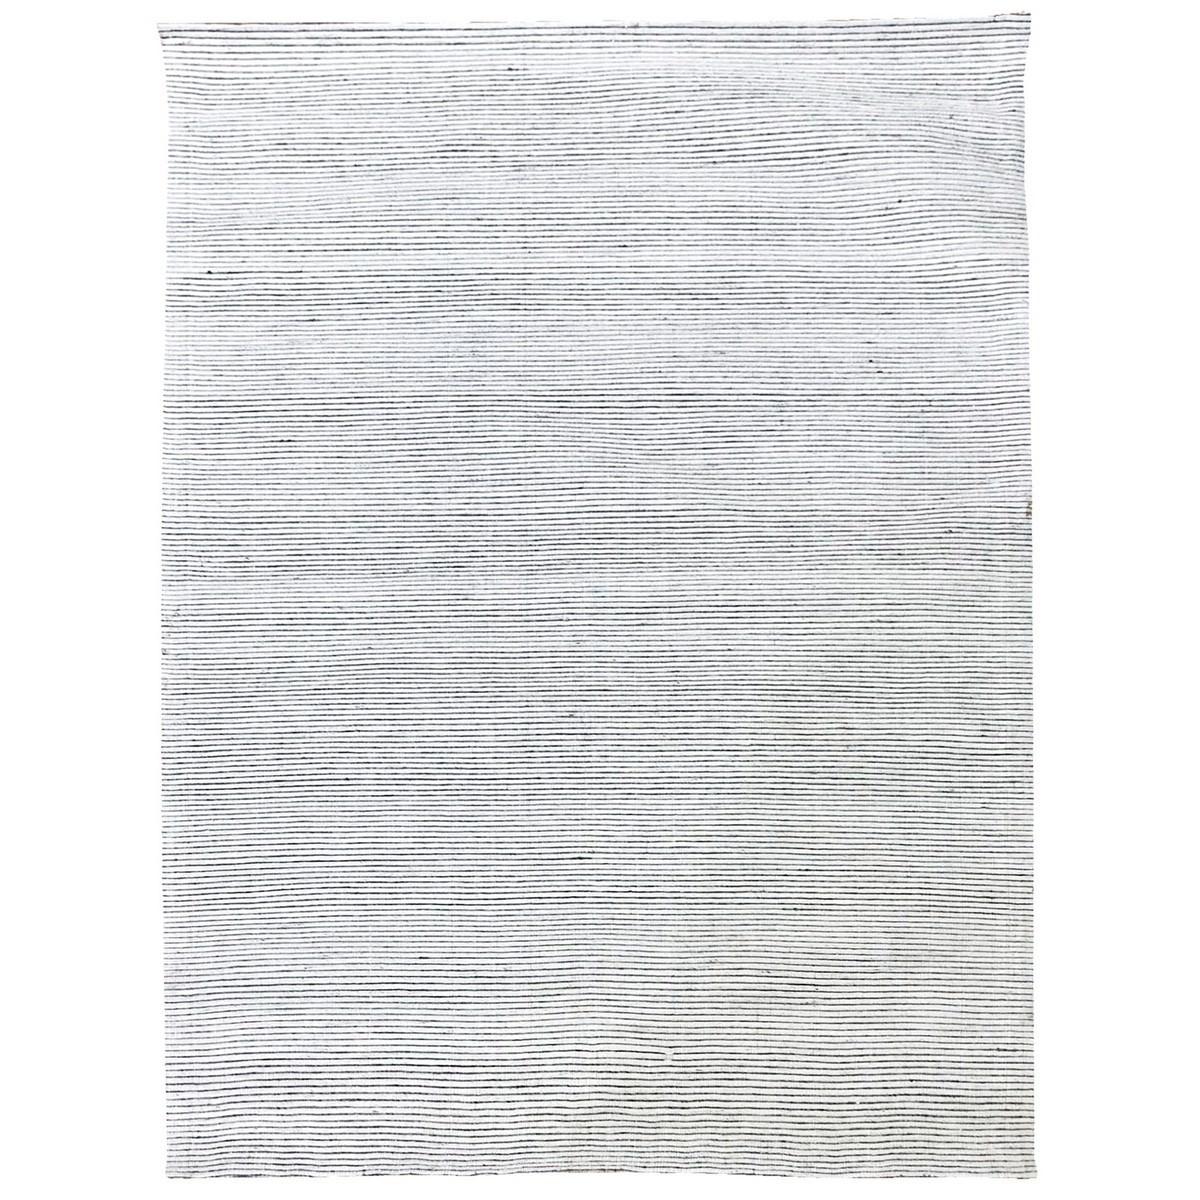 Ridges Handwoven Wool Rug, 230x160cm, Ivory